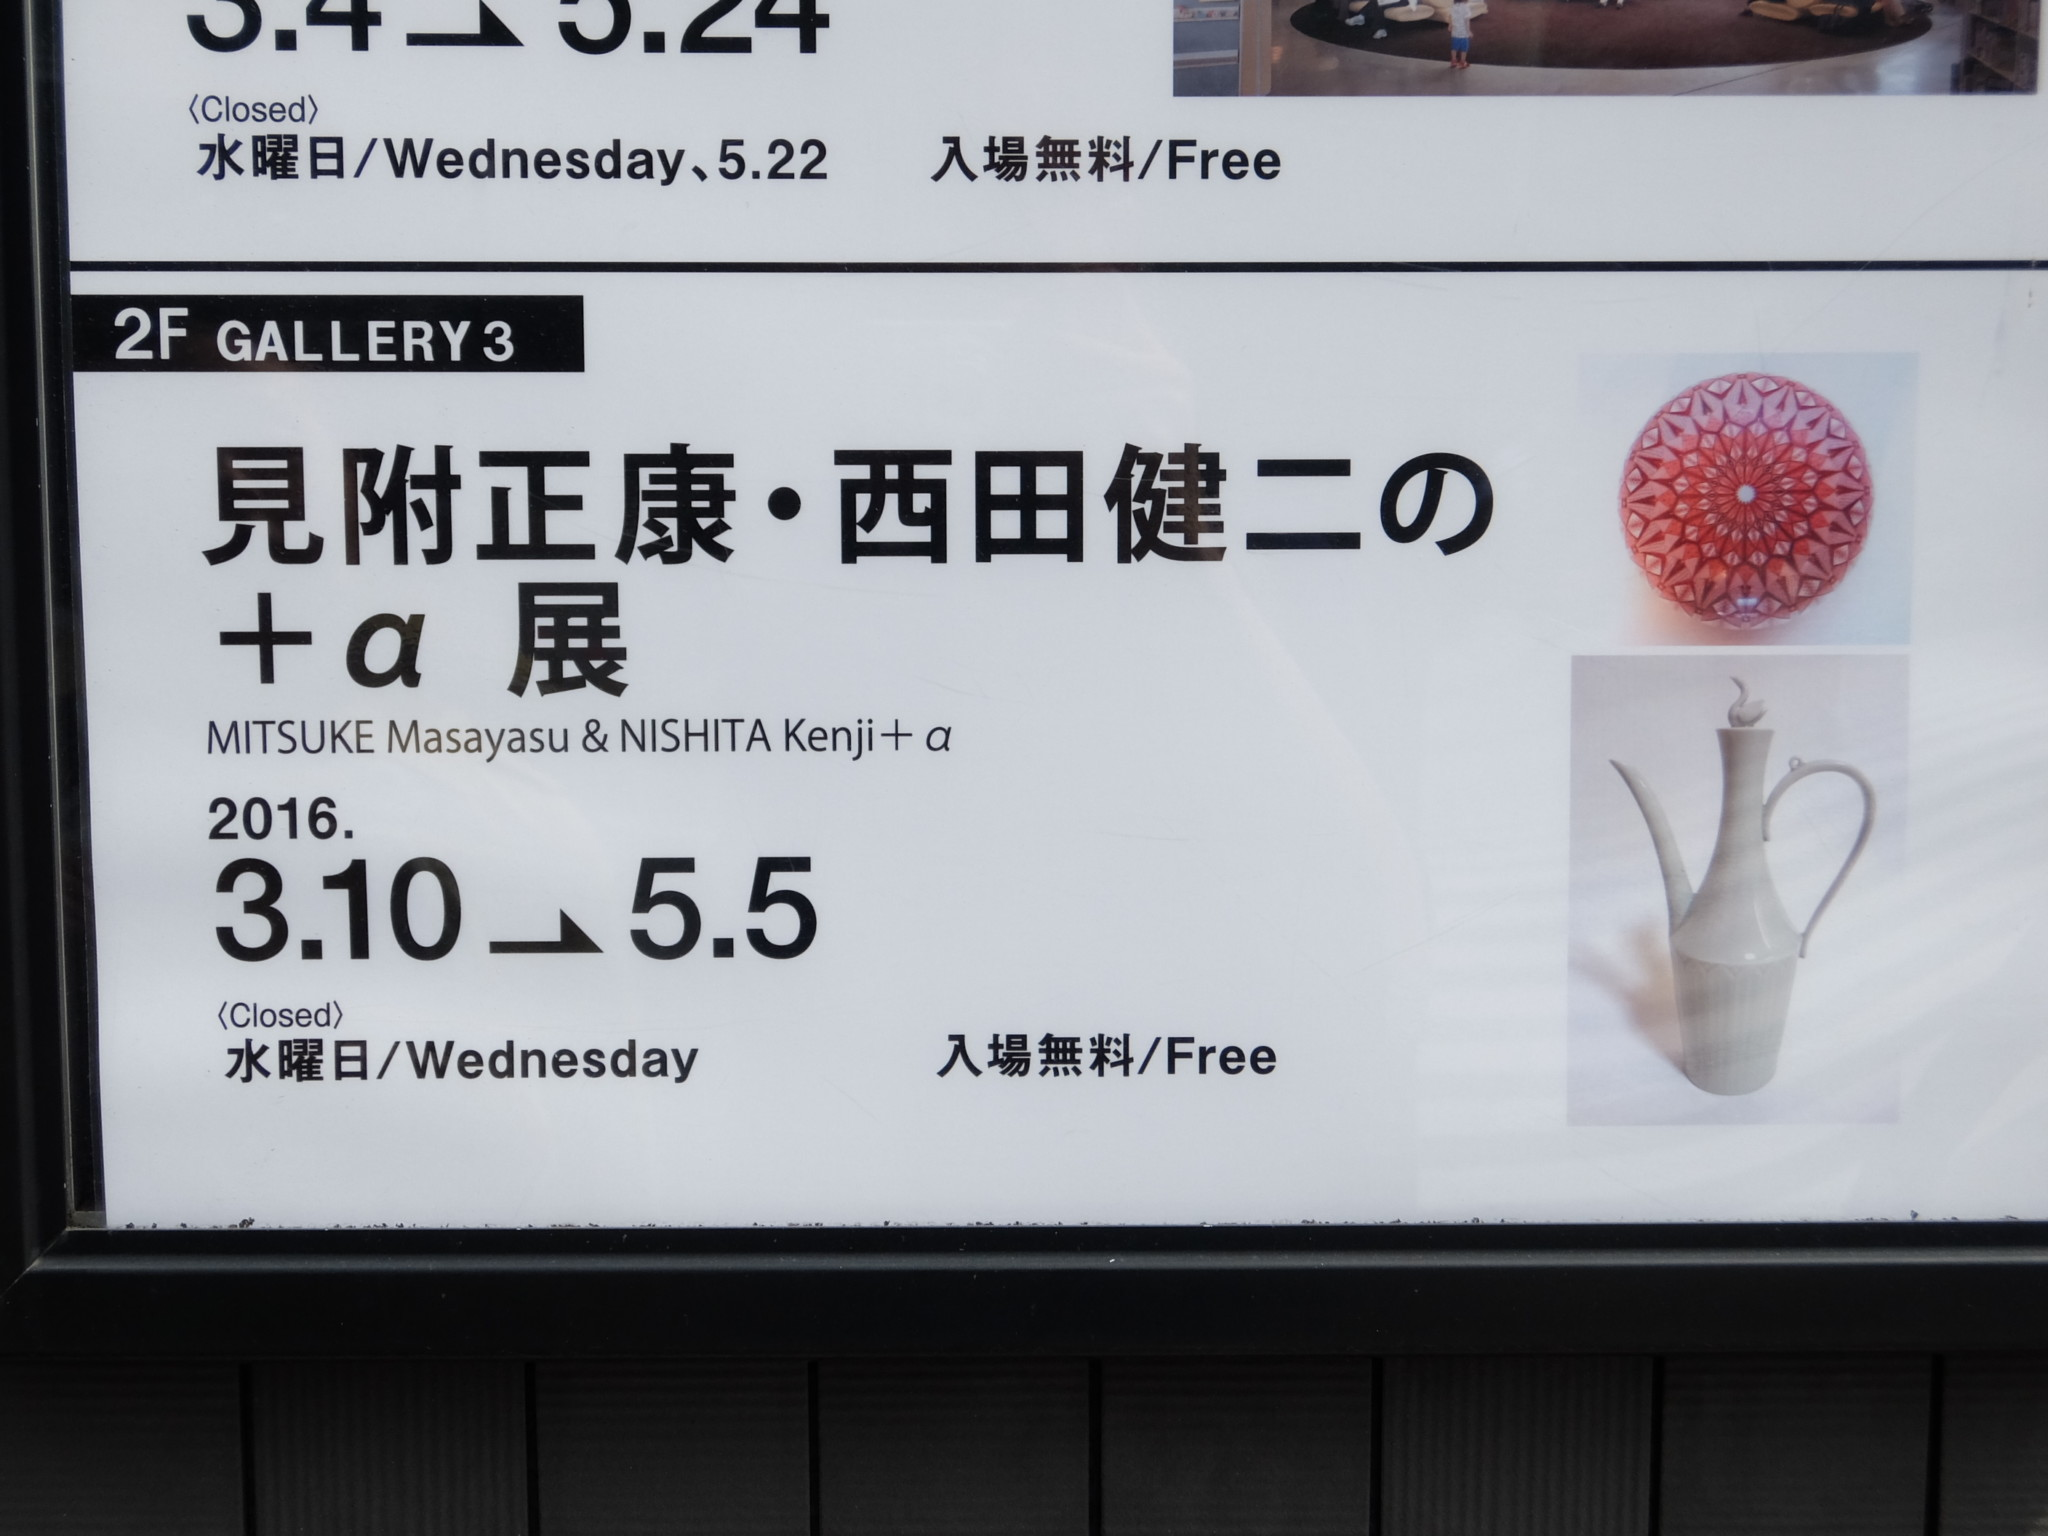 見附正康・西田健二の+α展